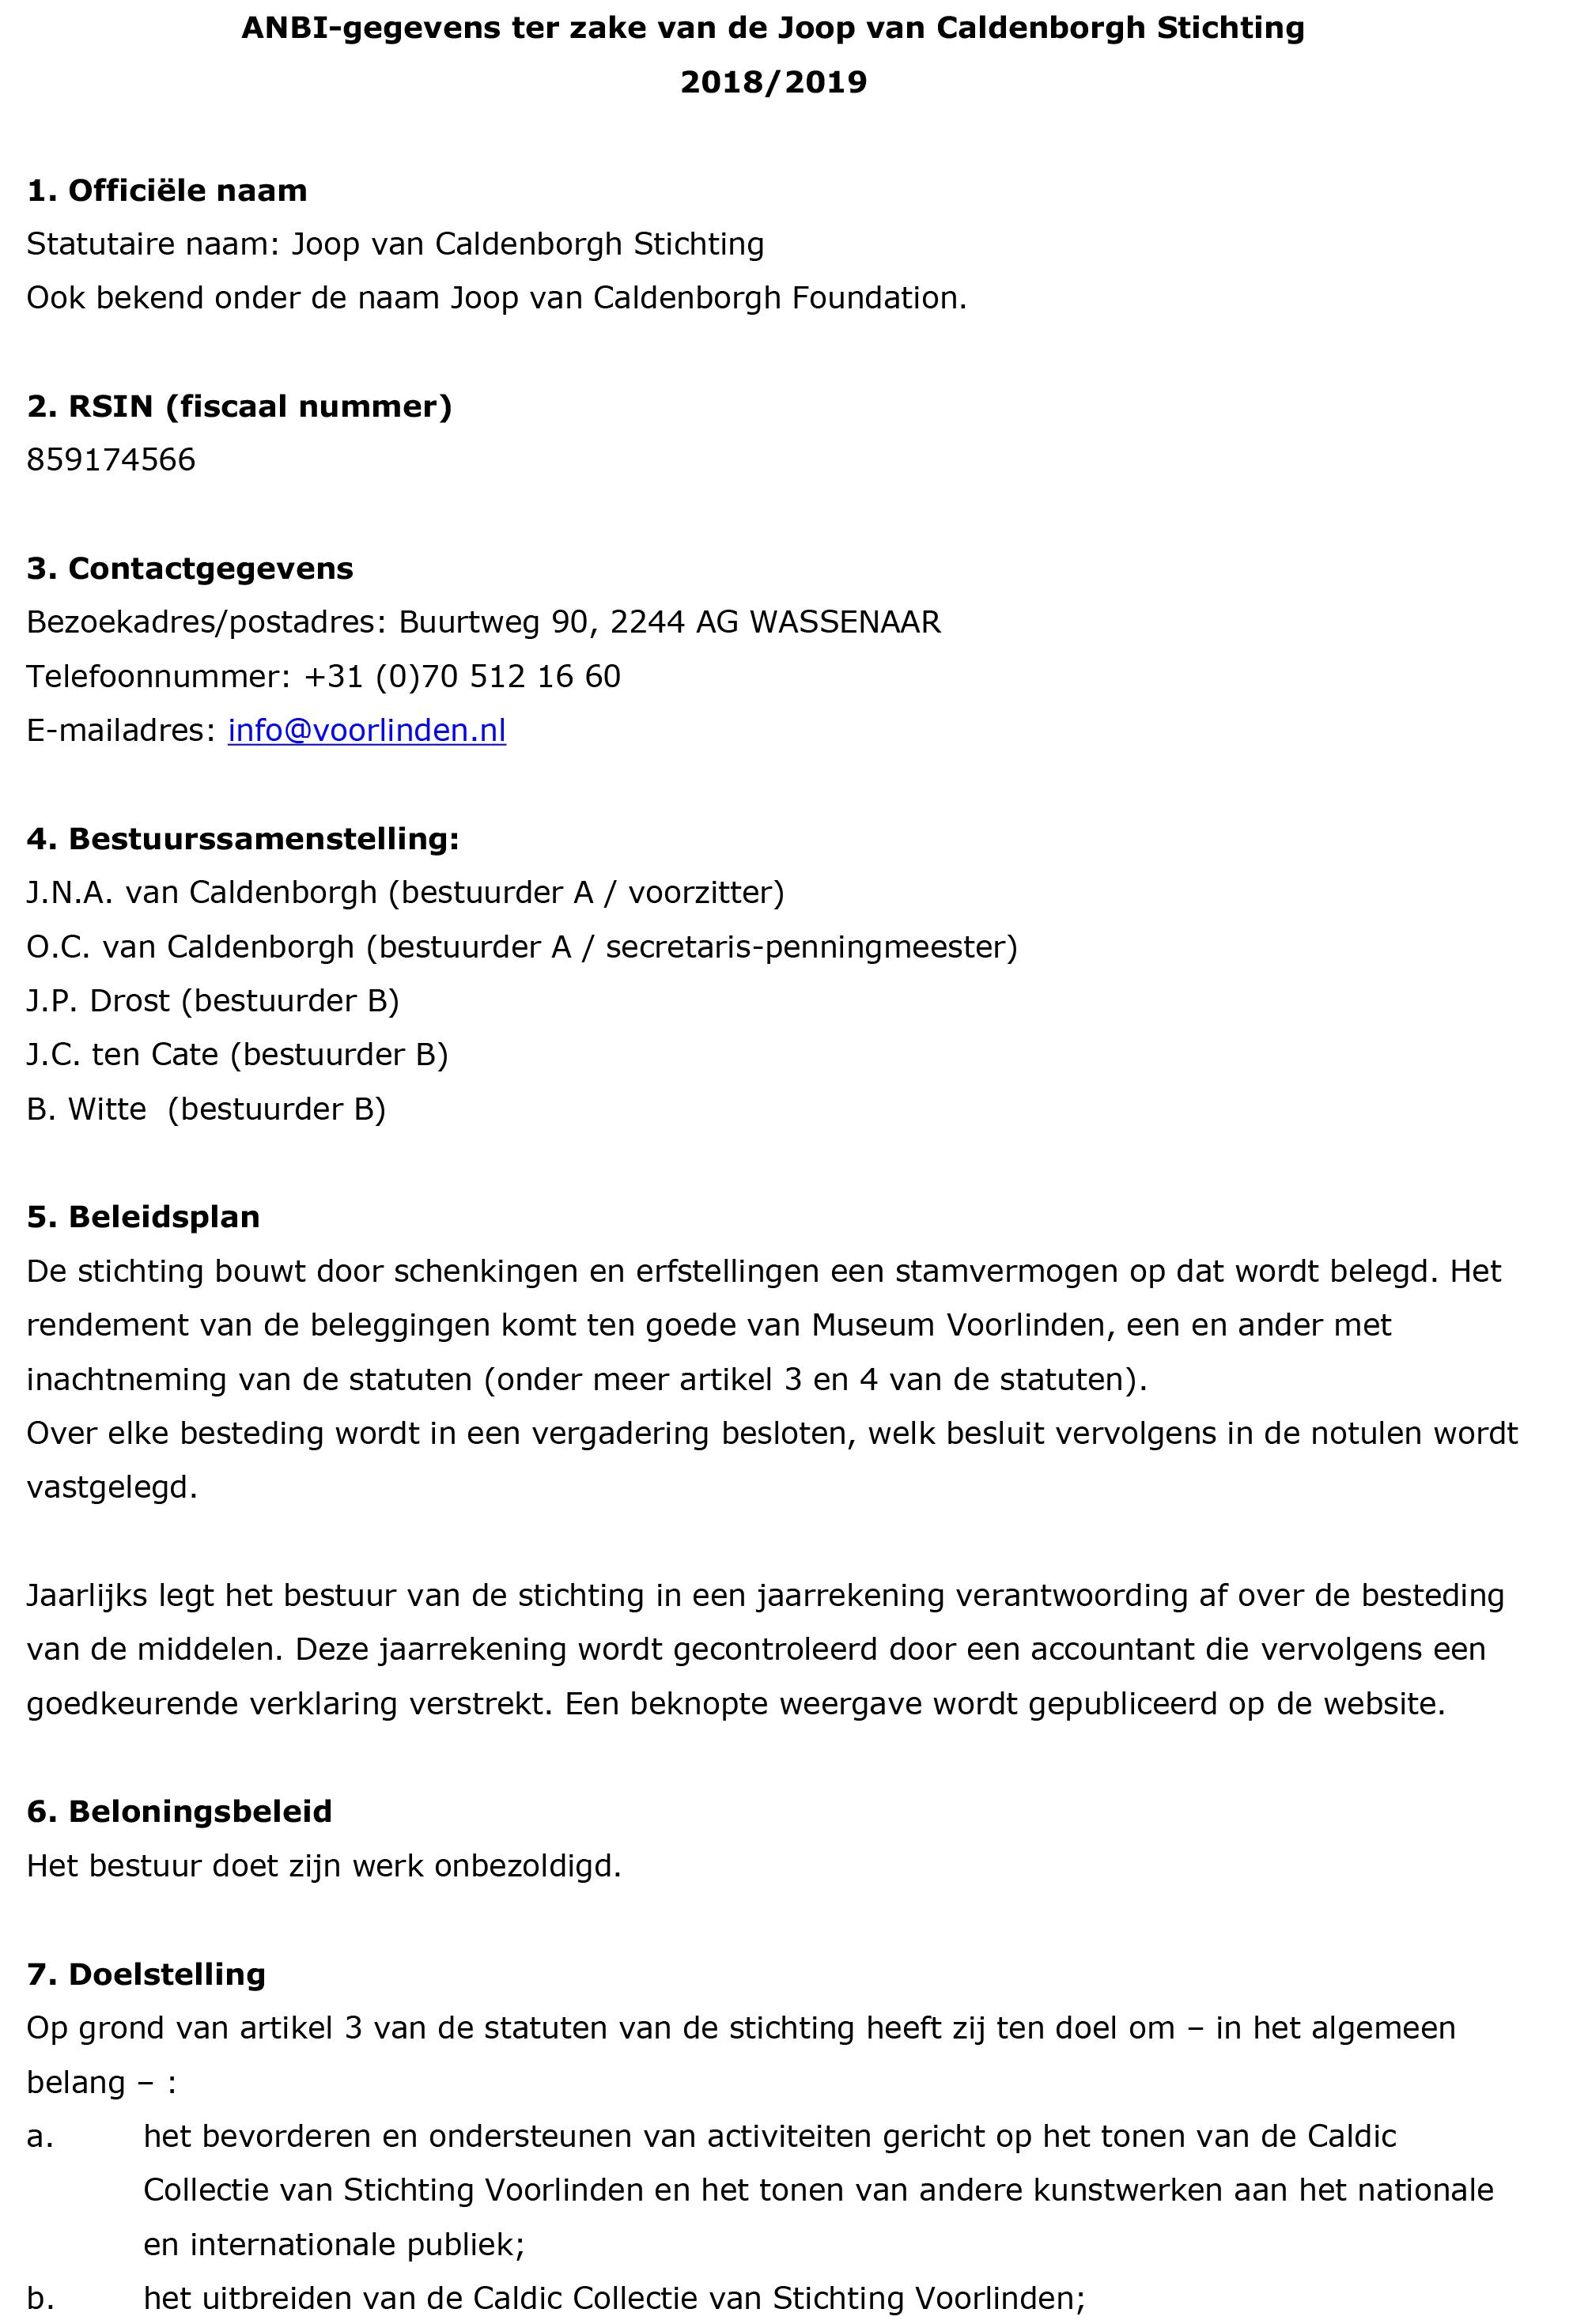 ANBI-gegevens Joop van Caldenborgh Stichting v2.docx-1